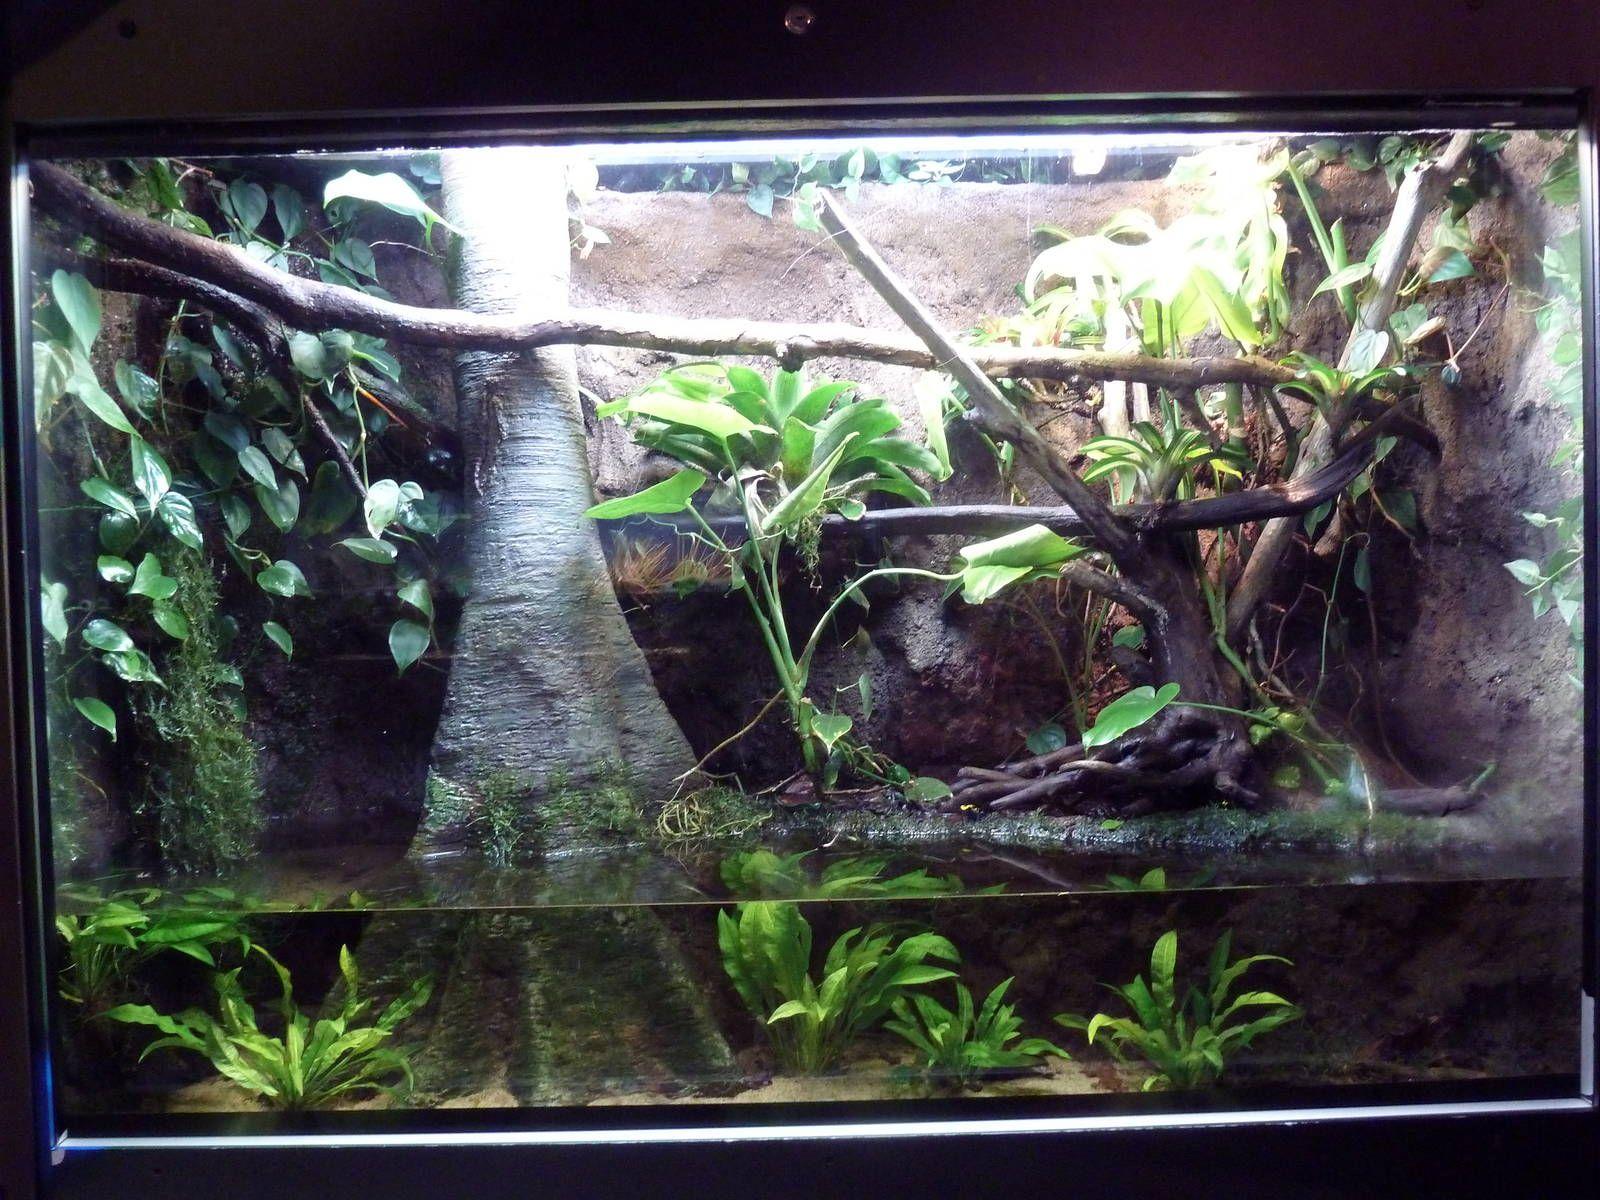 Fish tank terrarium - 104 Best Images About Fish Tanks Terrariums Fairy Gardens On Pinterest Moss Terrarium Water Terrarium And Terrarium